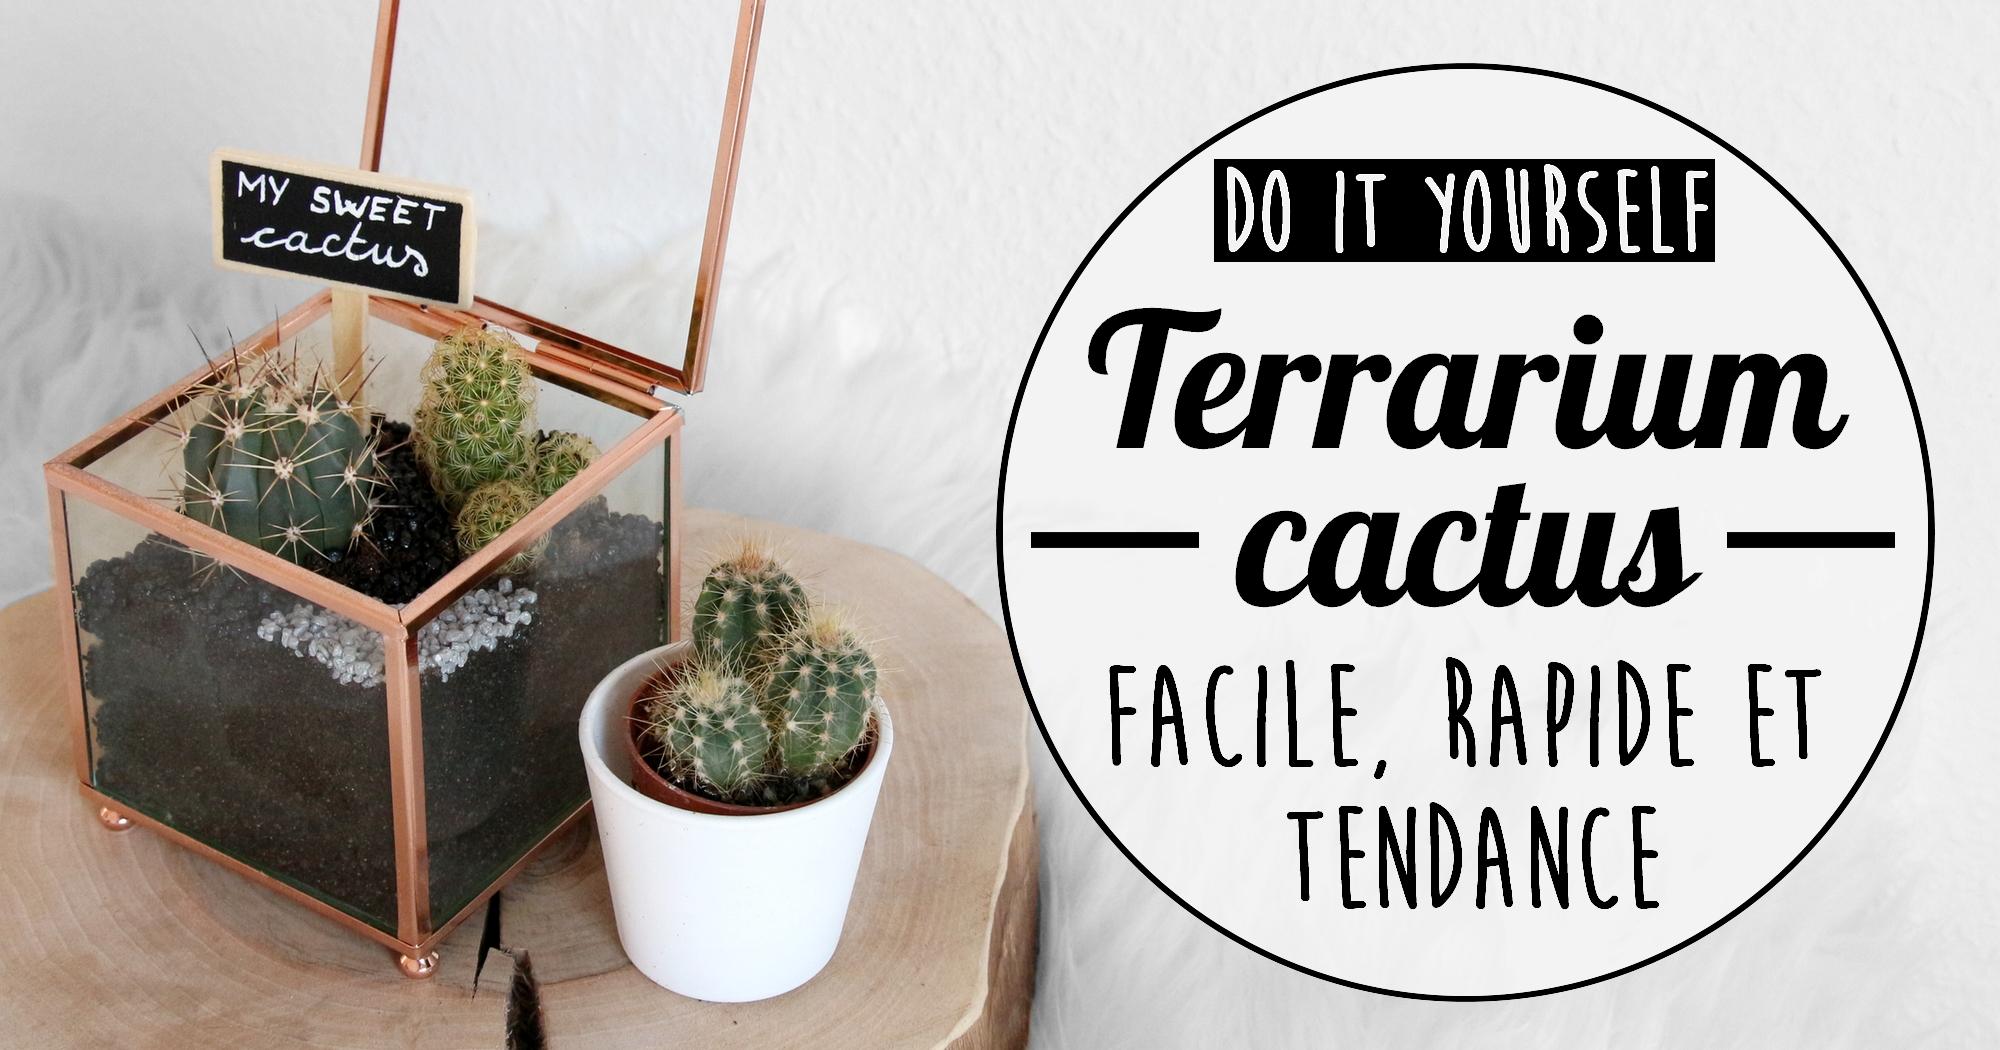 Do It Yourself Fabriquer Un Terrarium Cactus My Sweet Cactus